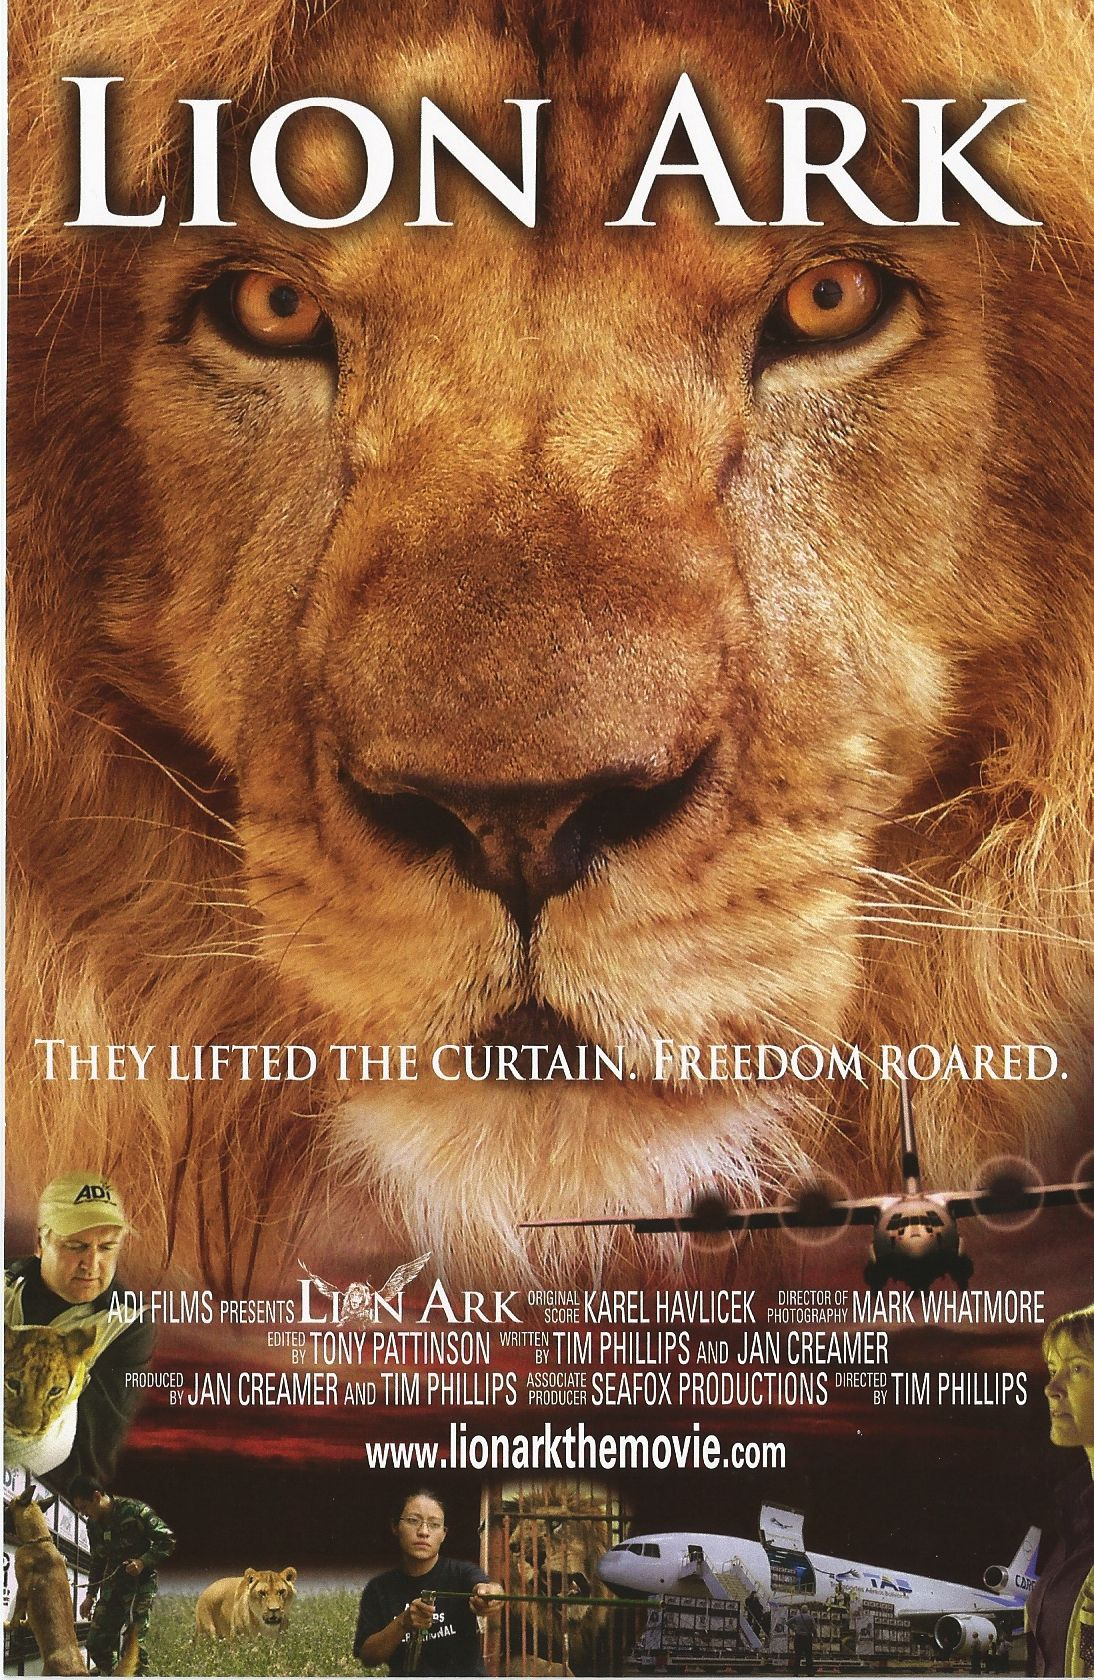 lionarkthemovie.com